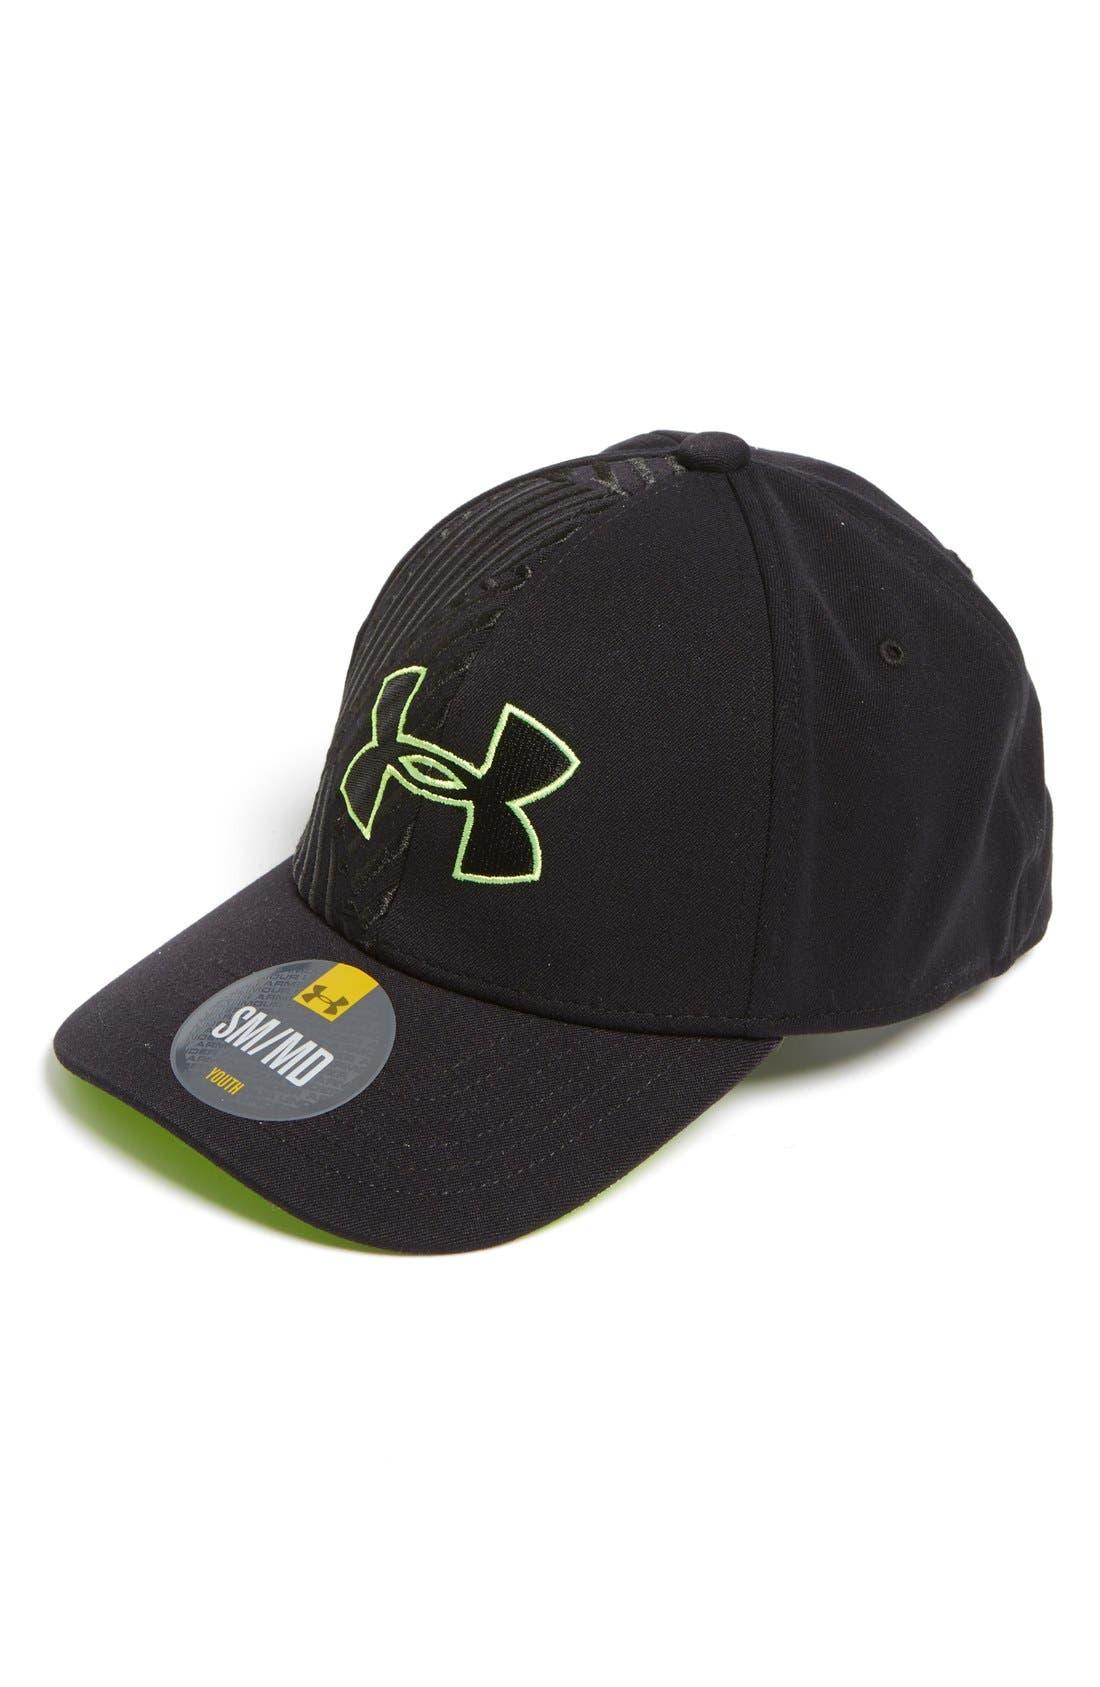 Main Image - BIG LOGO STRTCH FIT CAP